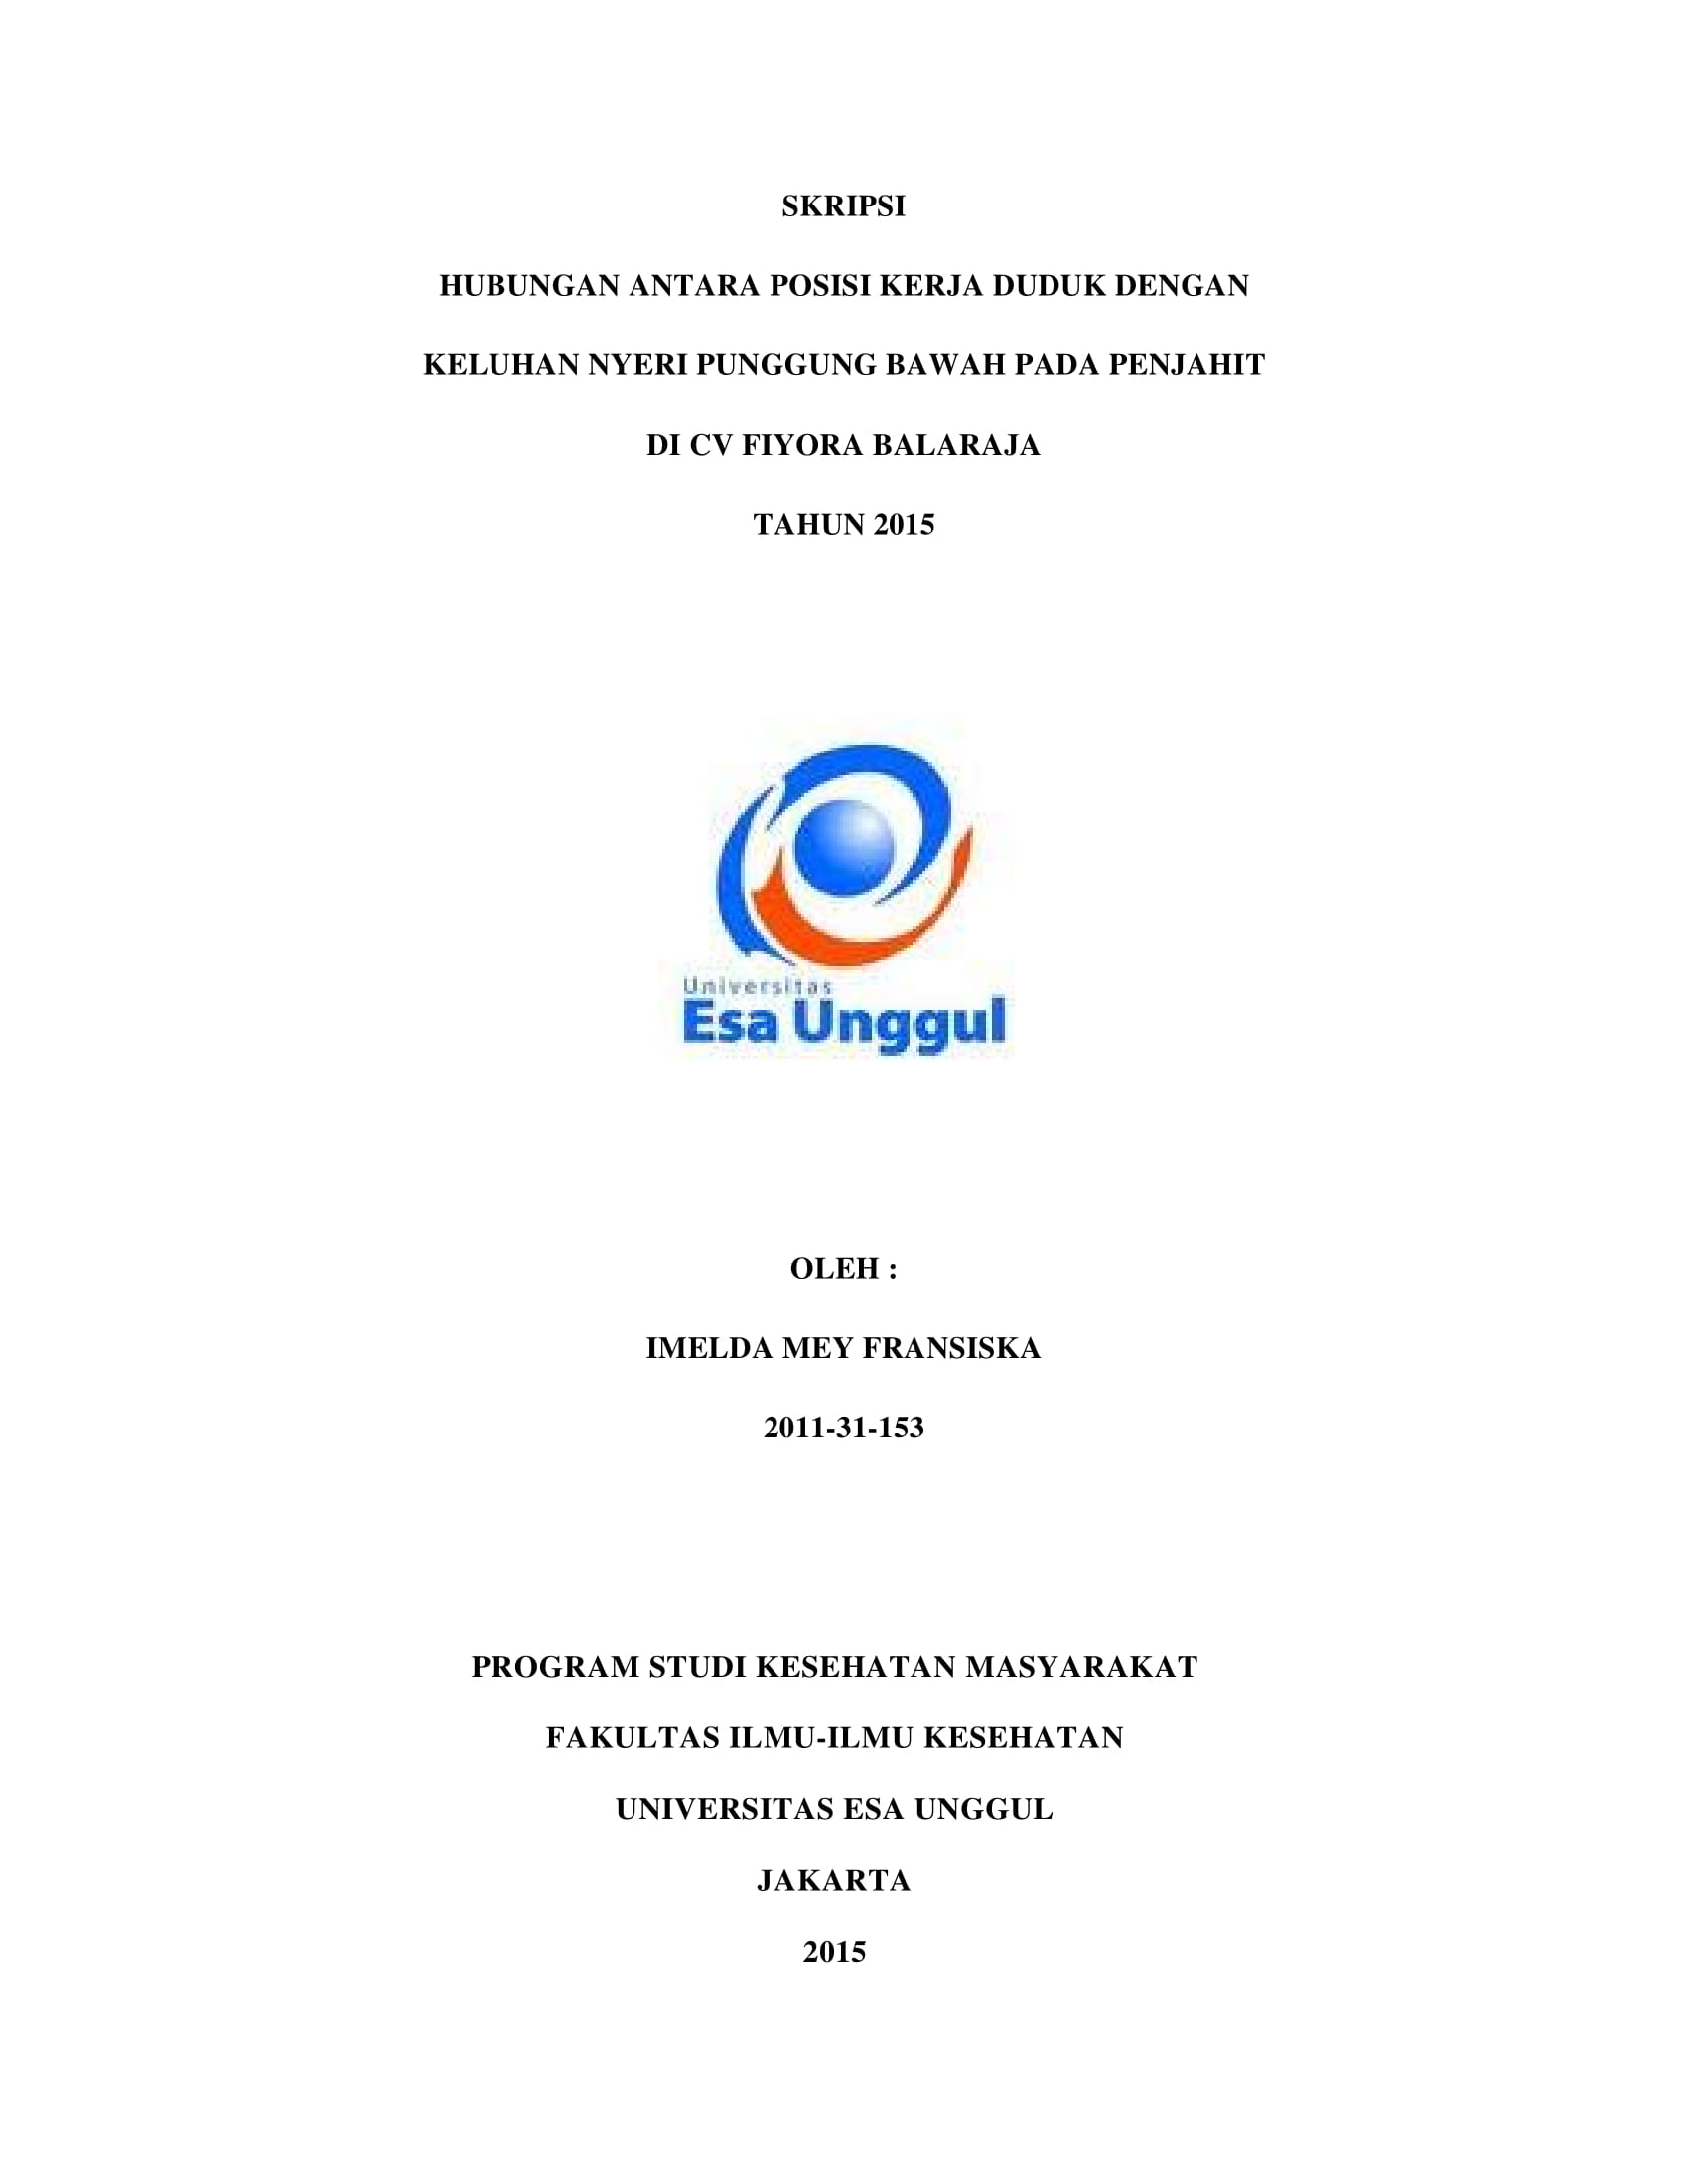 Hubungan Antara Posisi Kerja Duduk dengan Keluhan Nyeri Punggung Bawah pada Penjahit di CV Fiyora Balaraja Tahun 2015